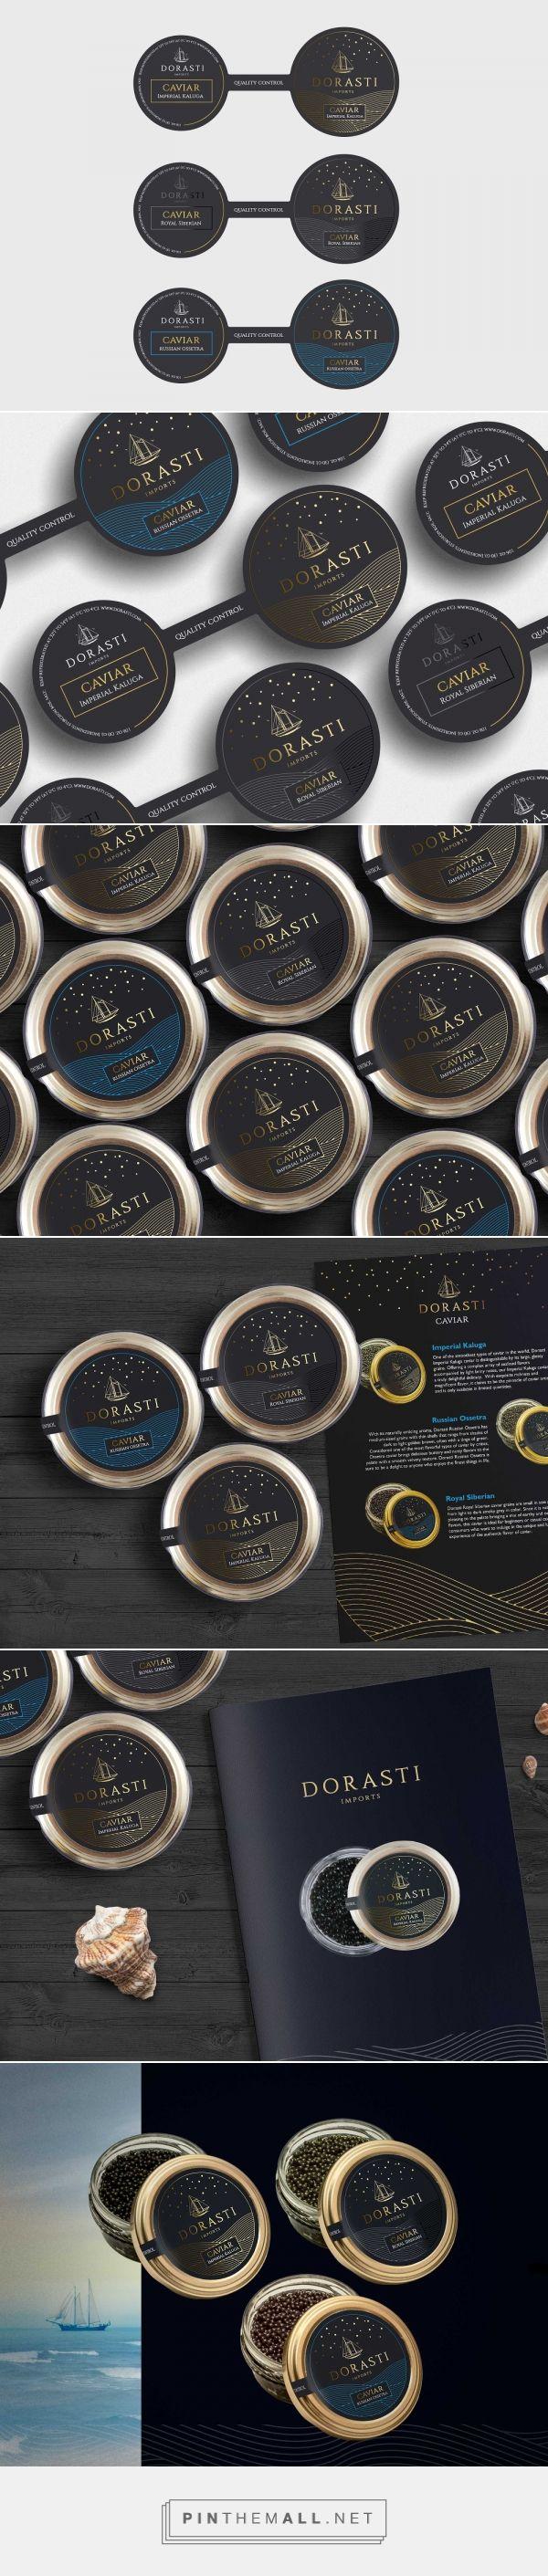 Dorasti Caviar - Packaging of the World - Creative Package Design Gallery - http://www.packagingoftheworld.com/2017/03/dorasti-caviar.html